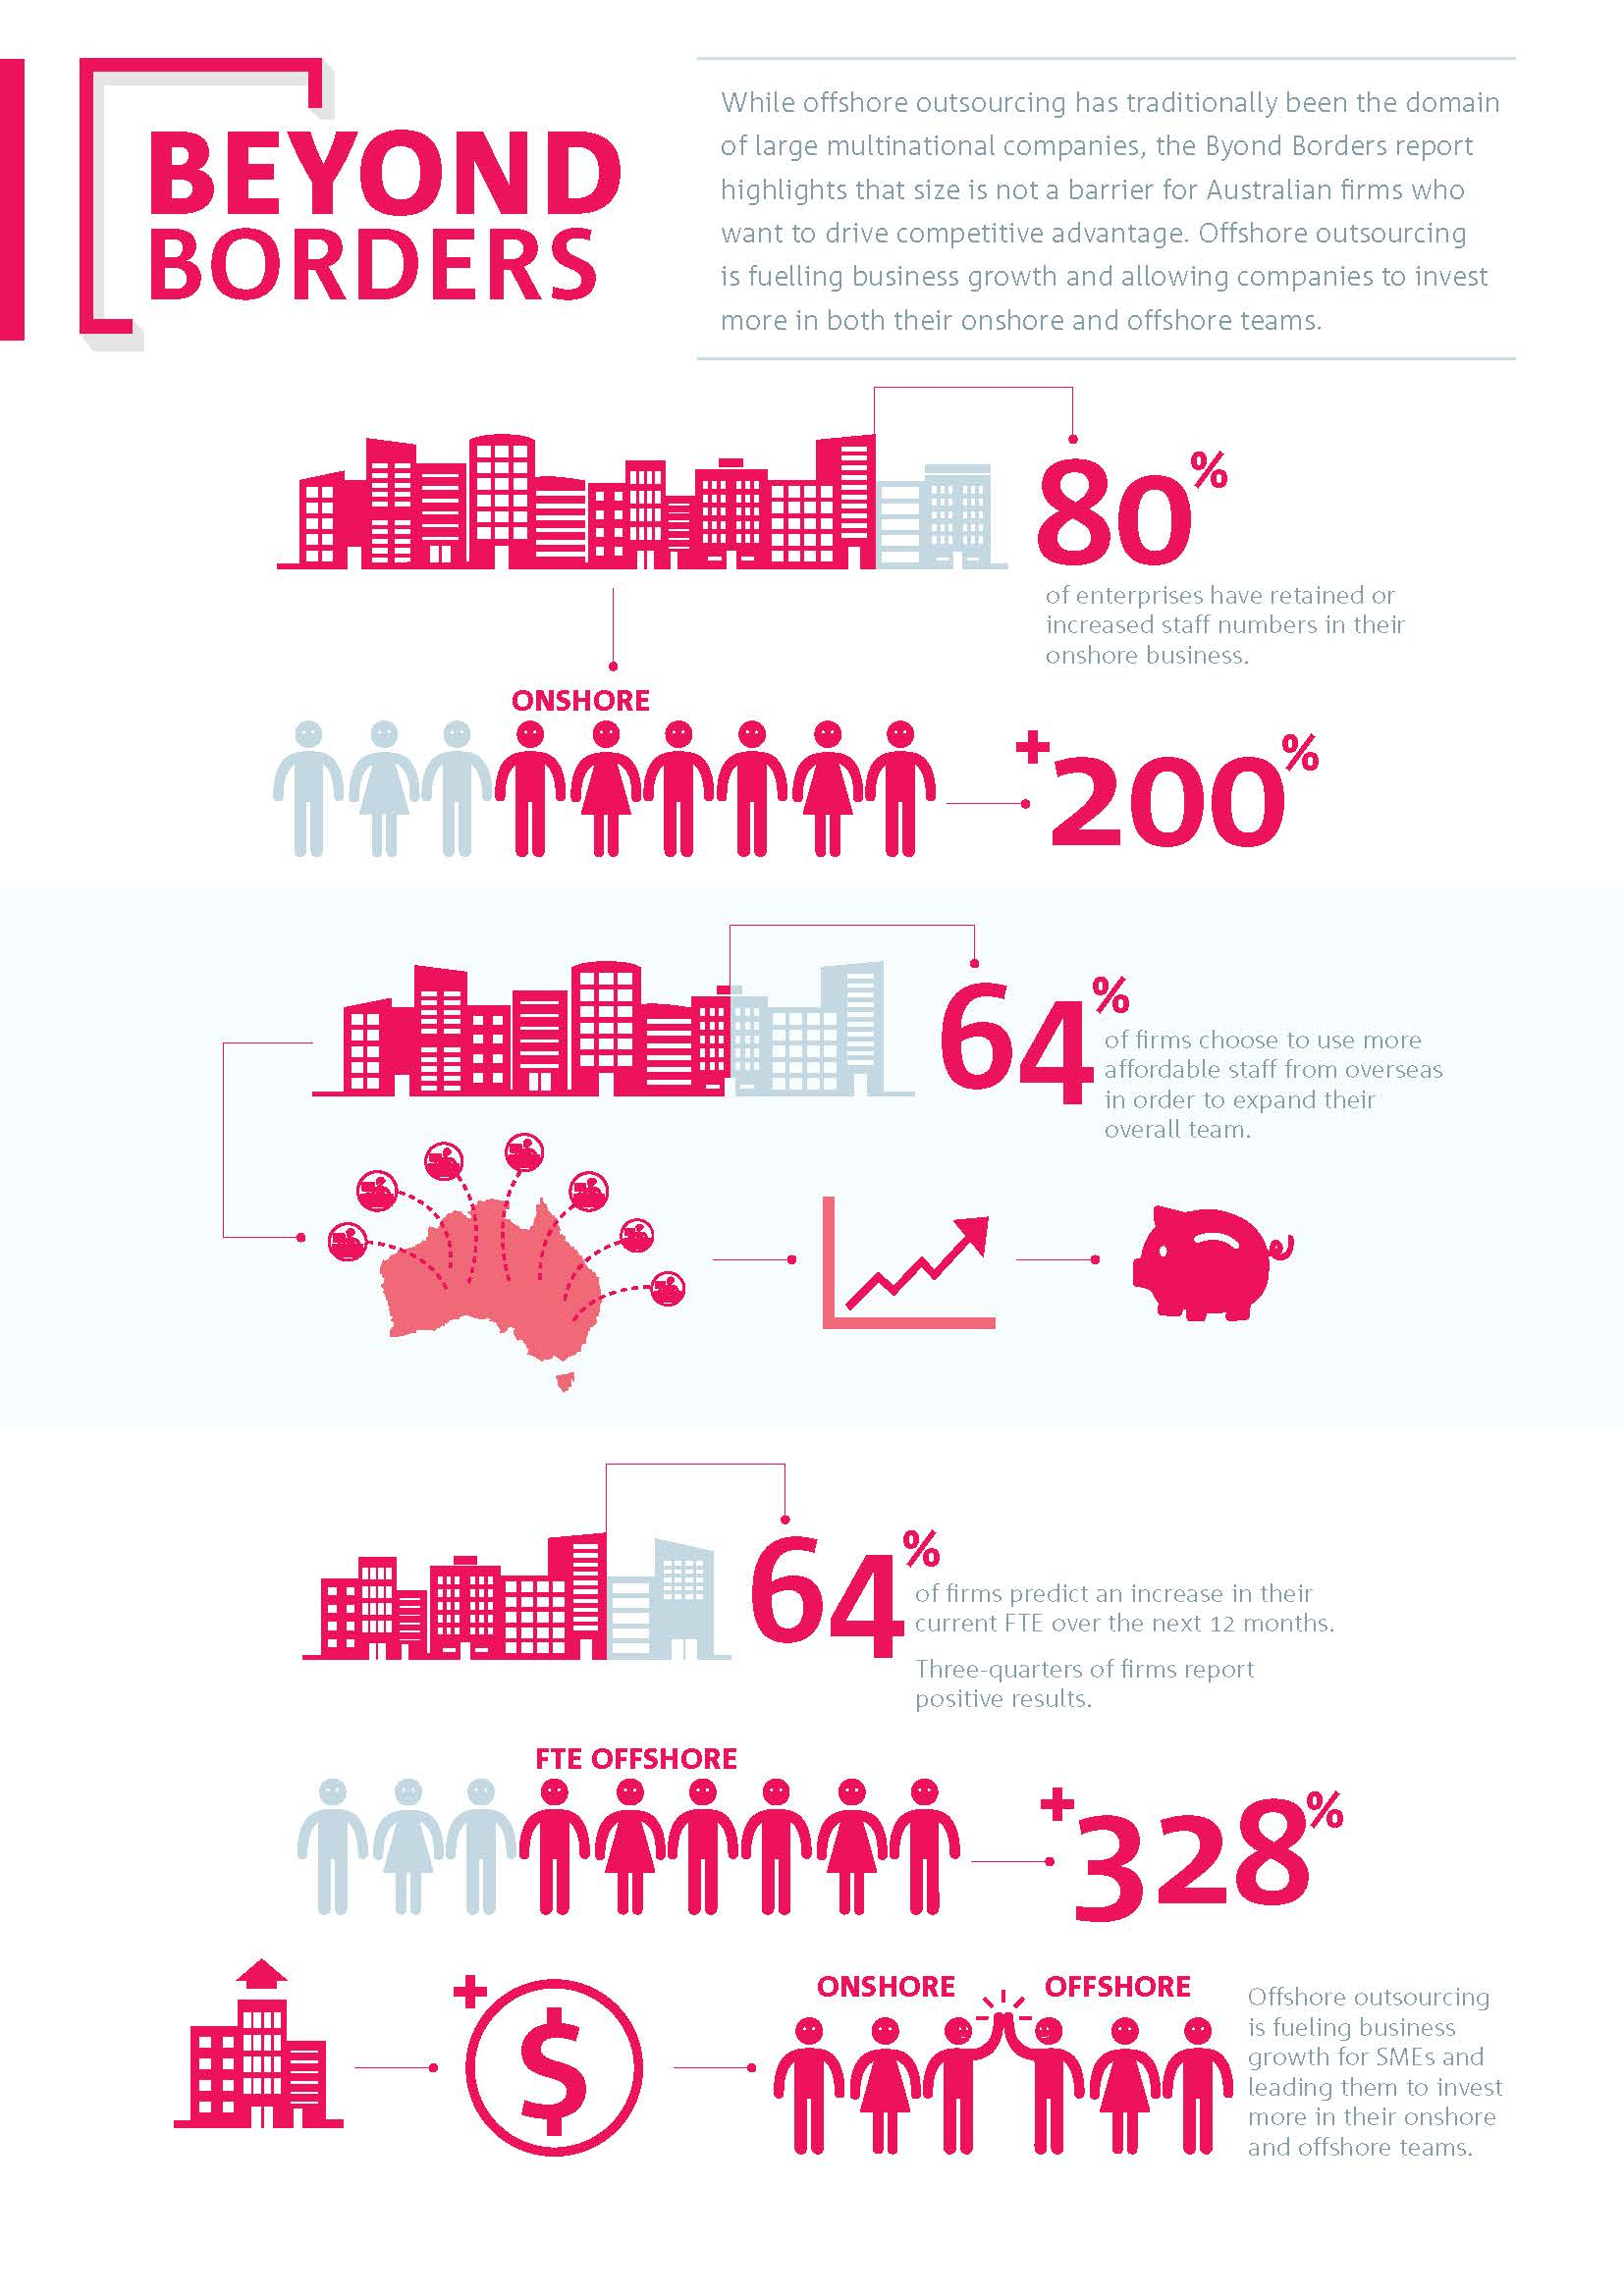 Salmat-Beyond-Borders-infographic-study